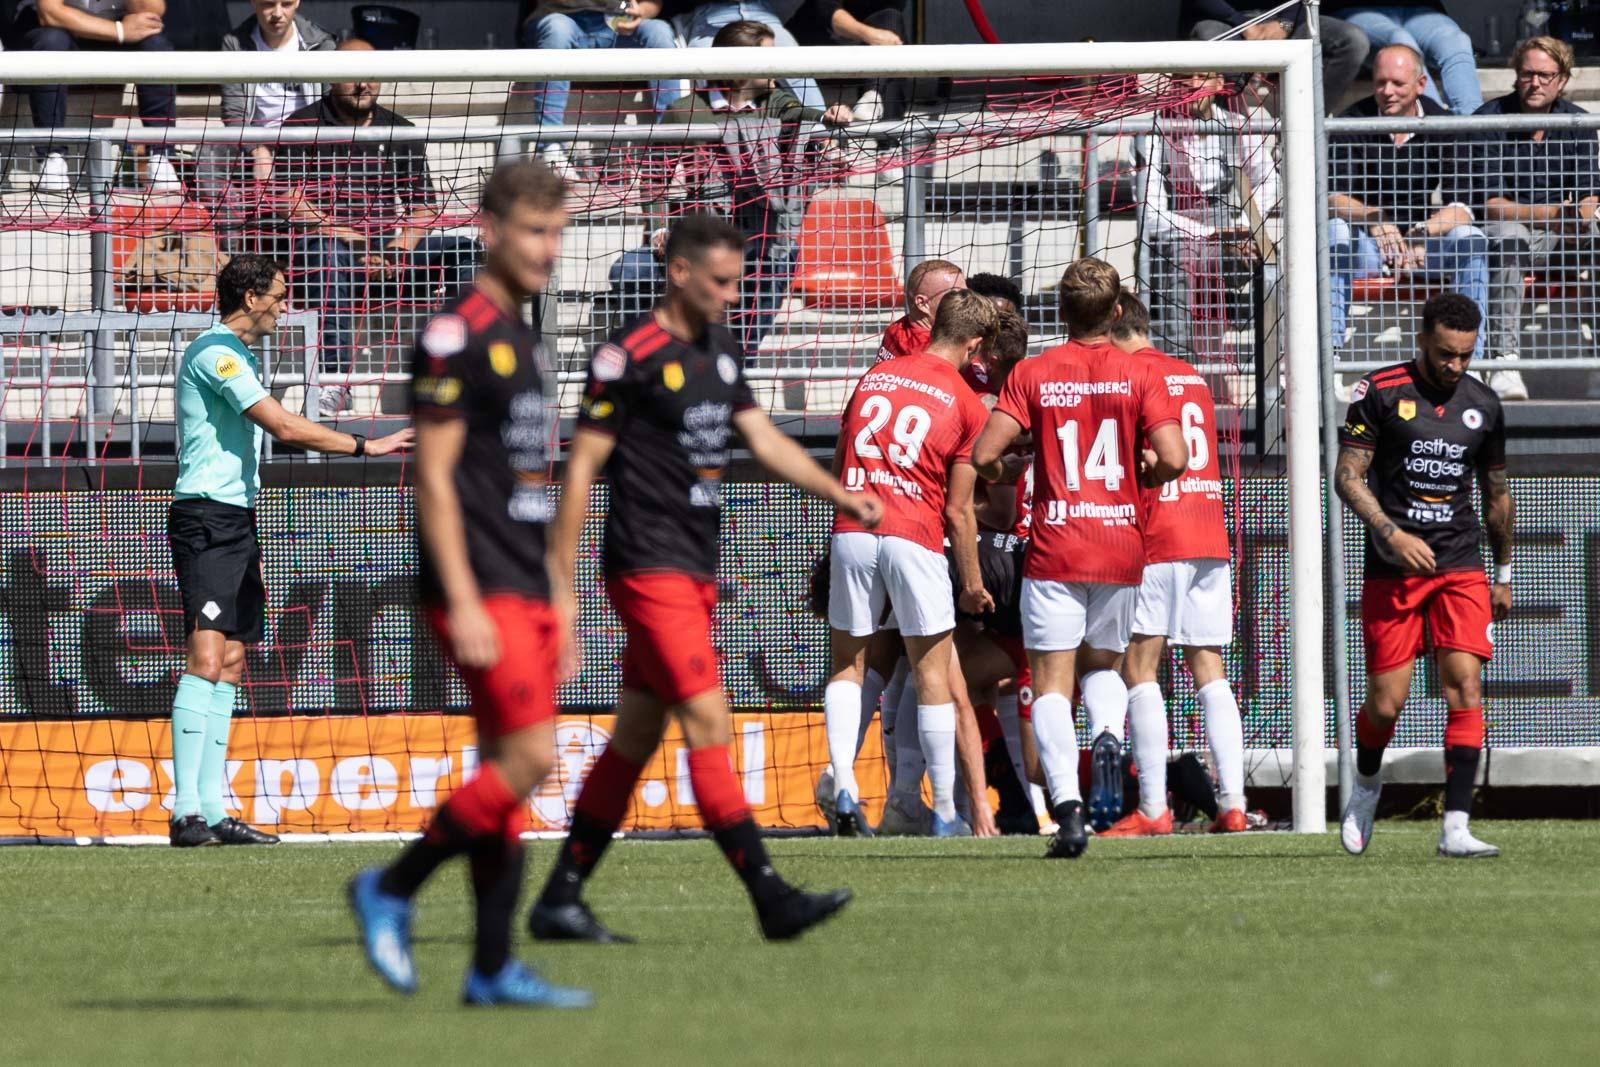 Almere City FC wint 'Lof der Zotheid': 4-6!